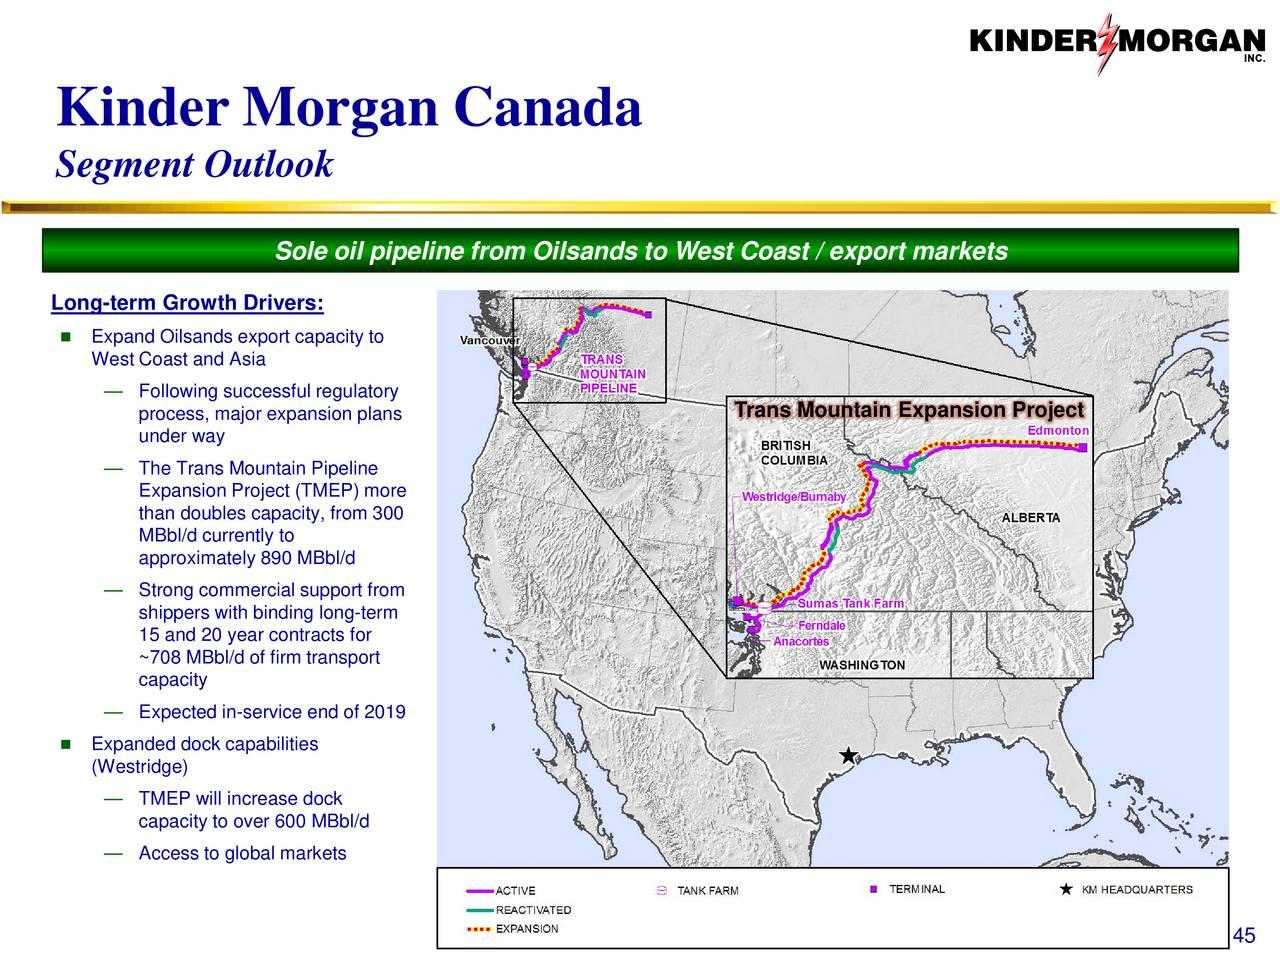 Kinder Morgan Stock Quote Kinder Morgan Stock Quote.kinder Morgan Stock Quote Captivating